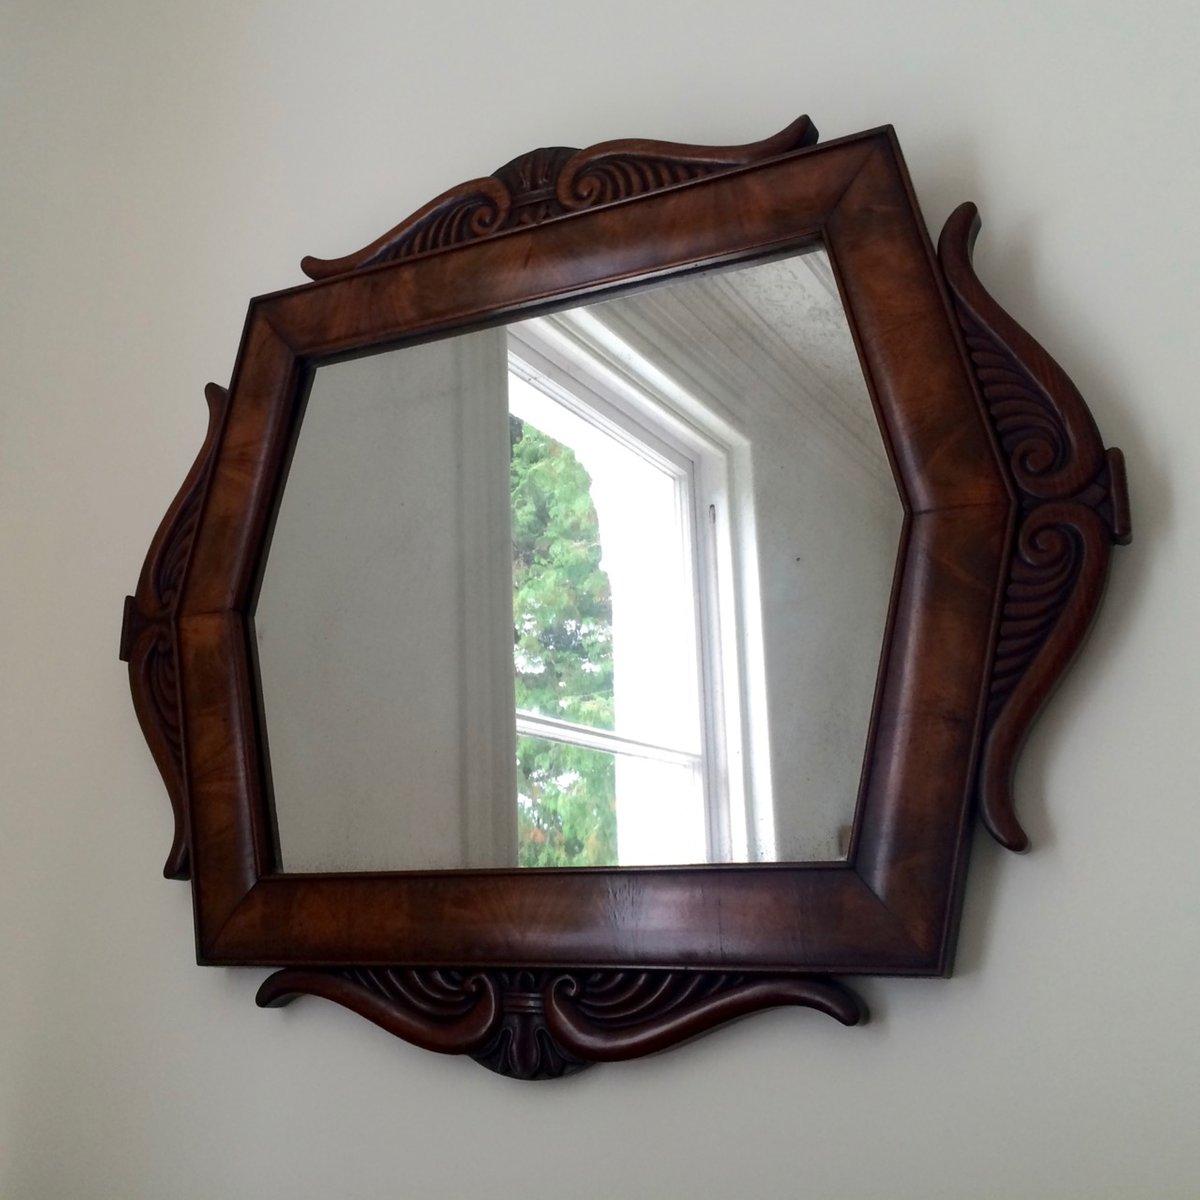 Miroir en acajou scandinavie 1860s en vente sur pamono for Miroir acajou